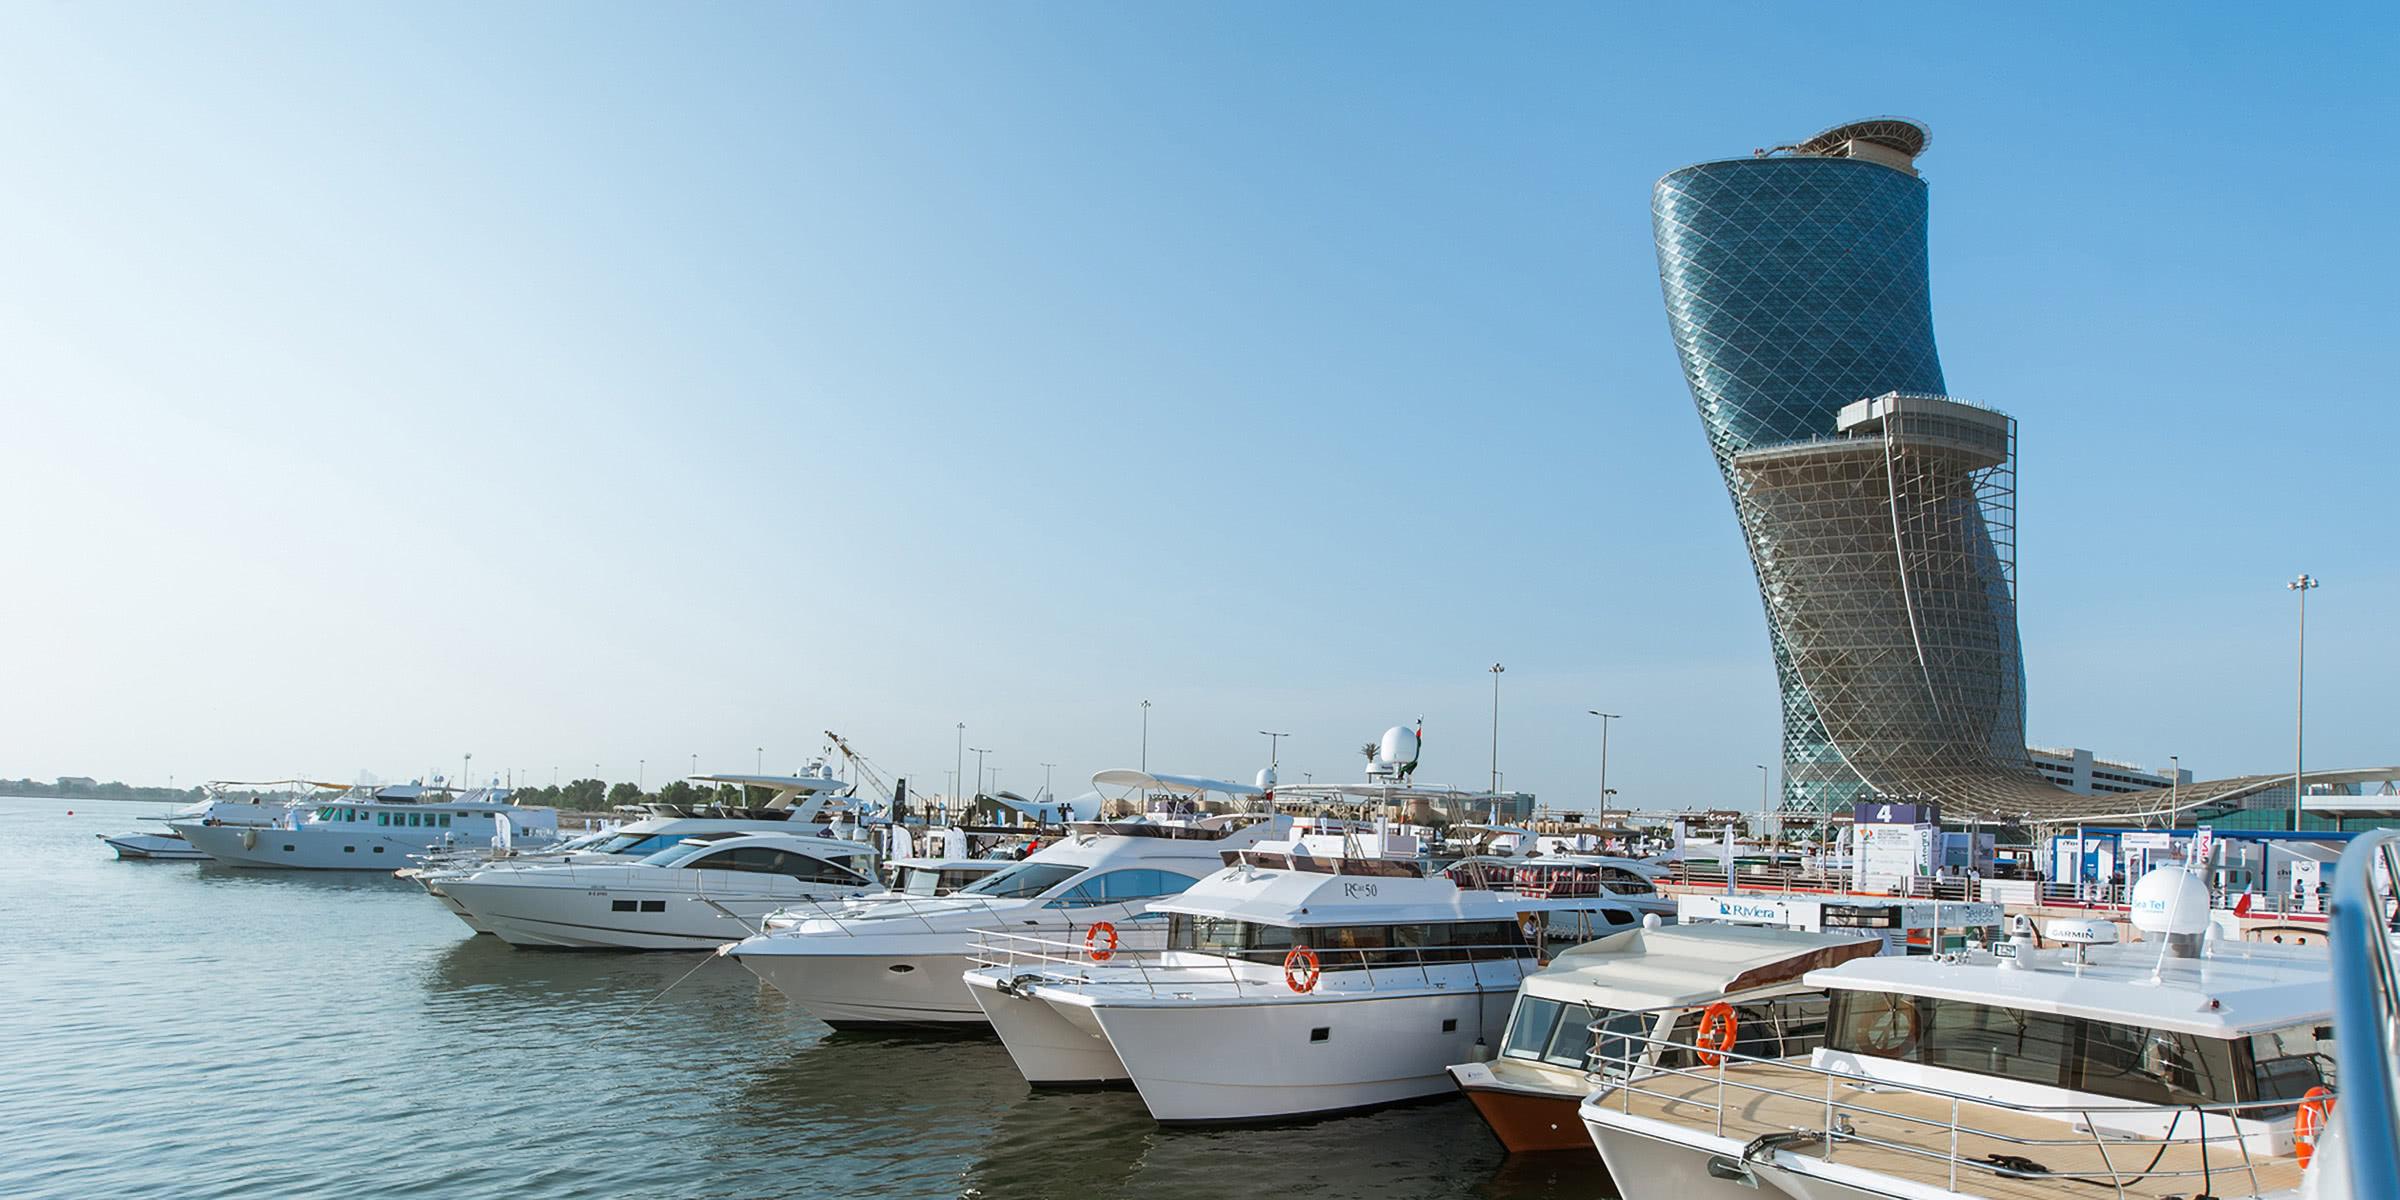 Abu Dhabi International Boat Show 2021 - Luxe Digital